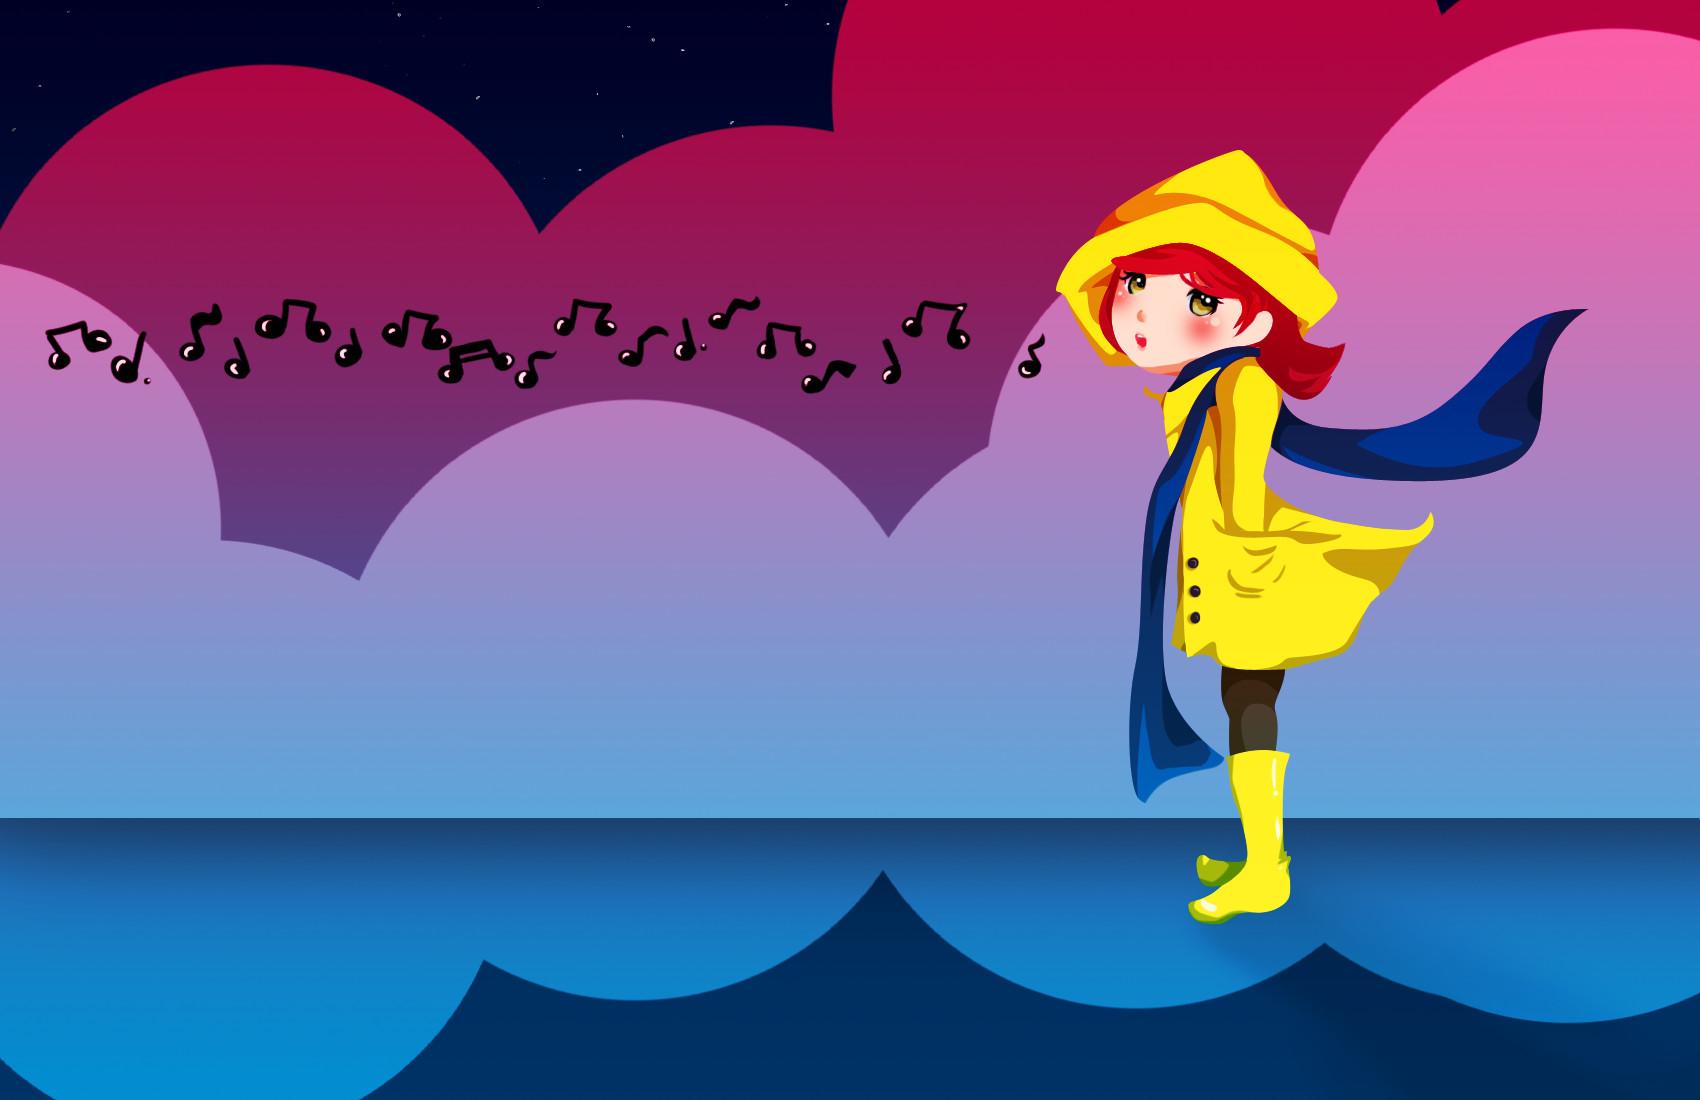 Singing In The Rain Wallpaper By Little Star Of Light On Deviantart